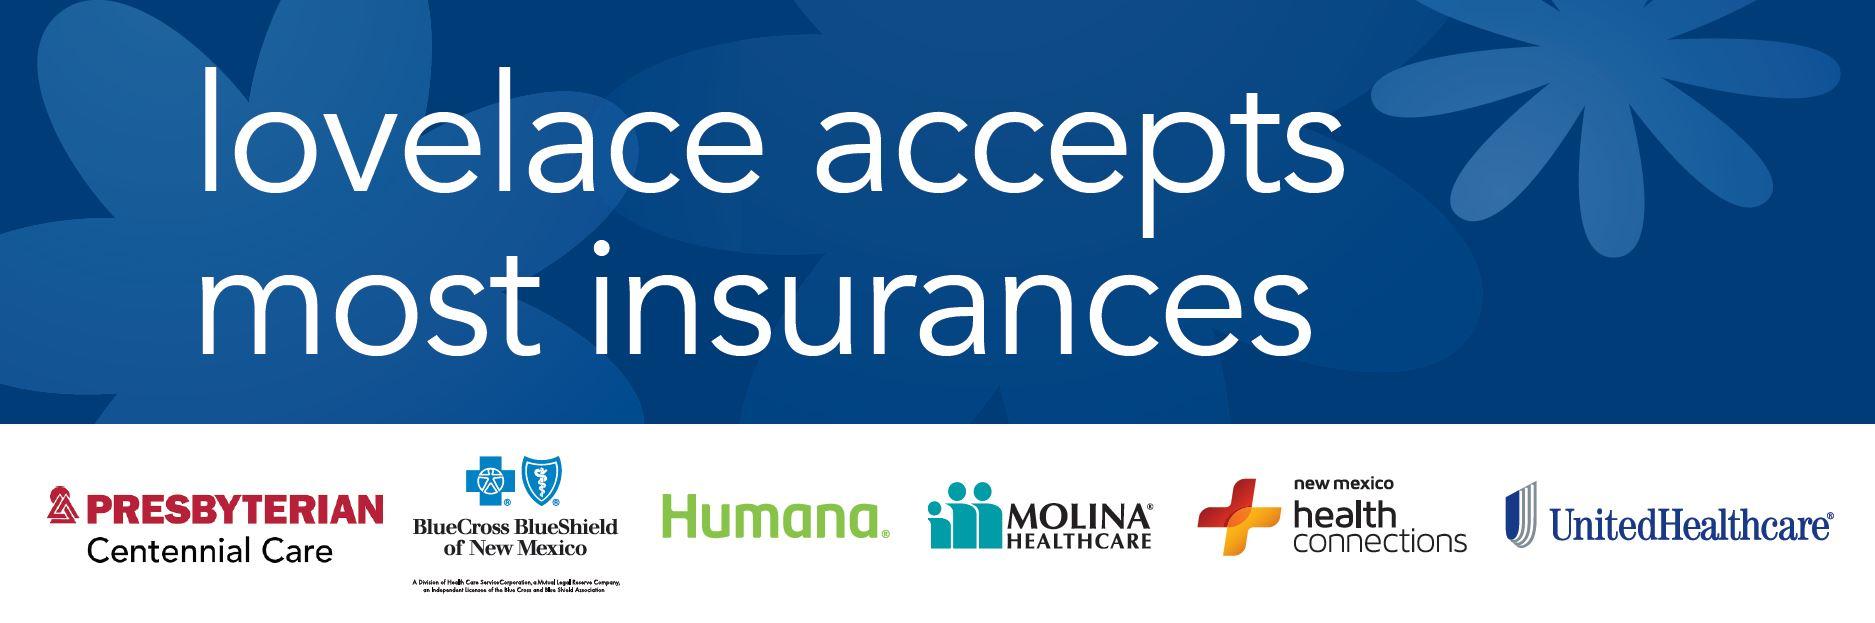 Lovelace accepts most major insurances including Presbyterian Centennial Care